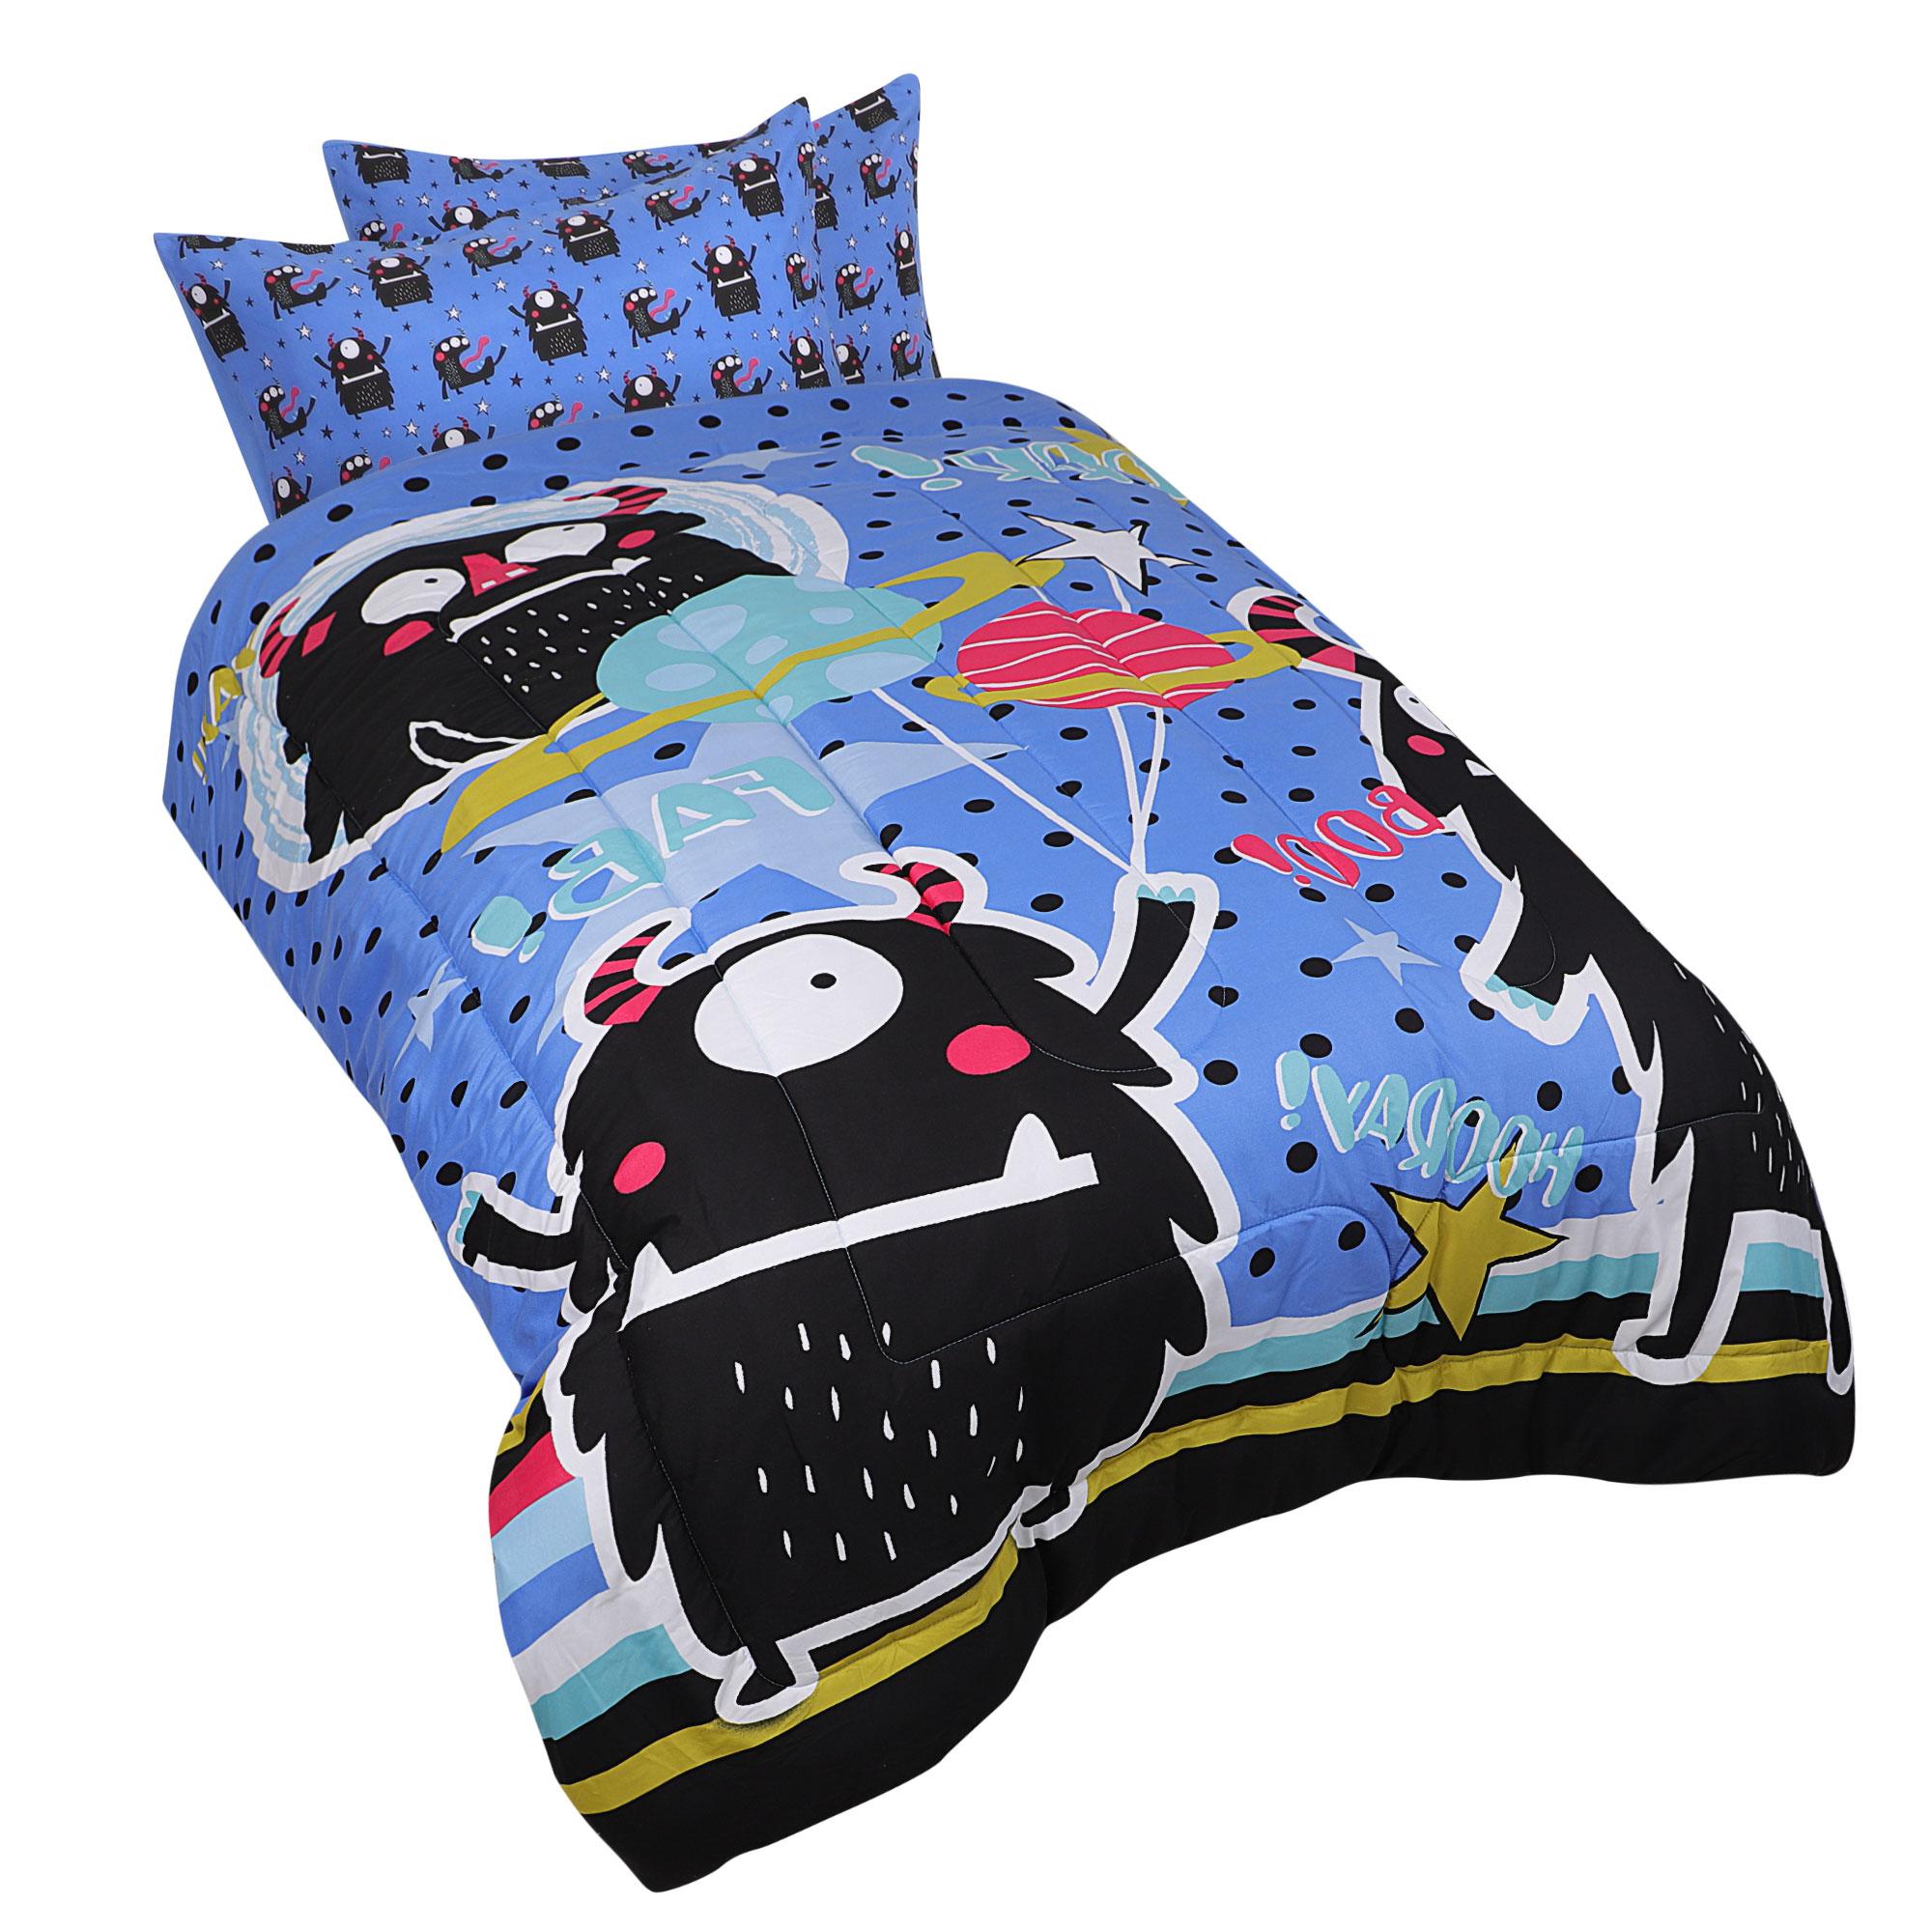 3 Piece Polyester Microfiber Kids Bedding Comforter Set Black Monster Twin